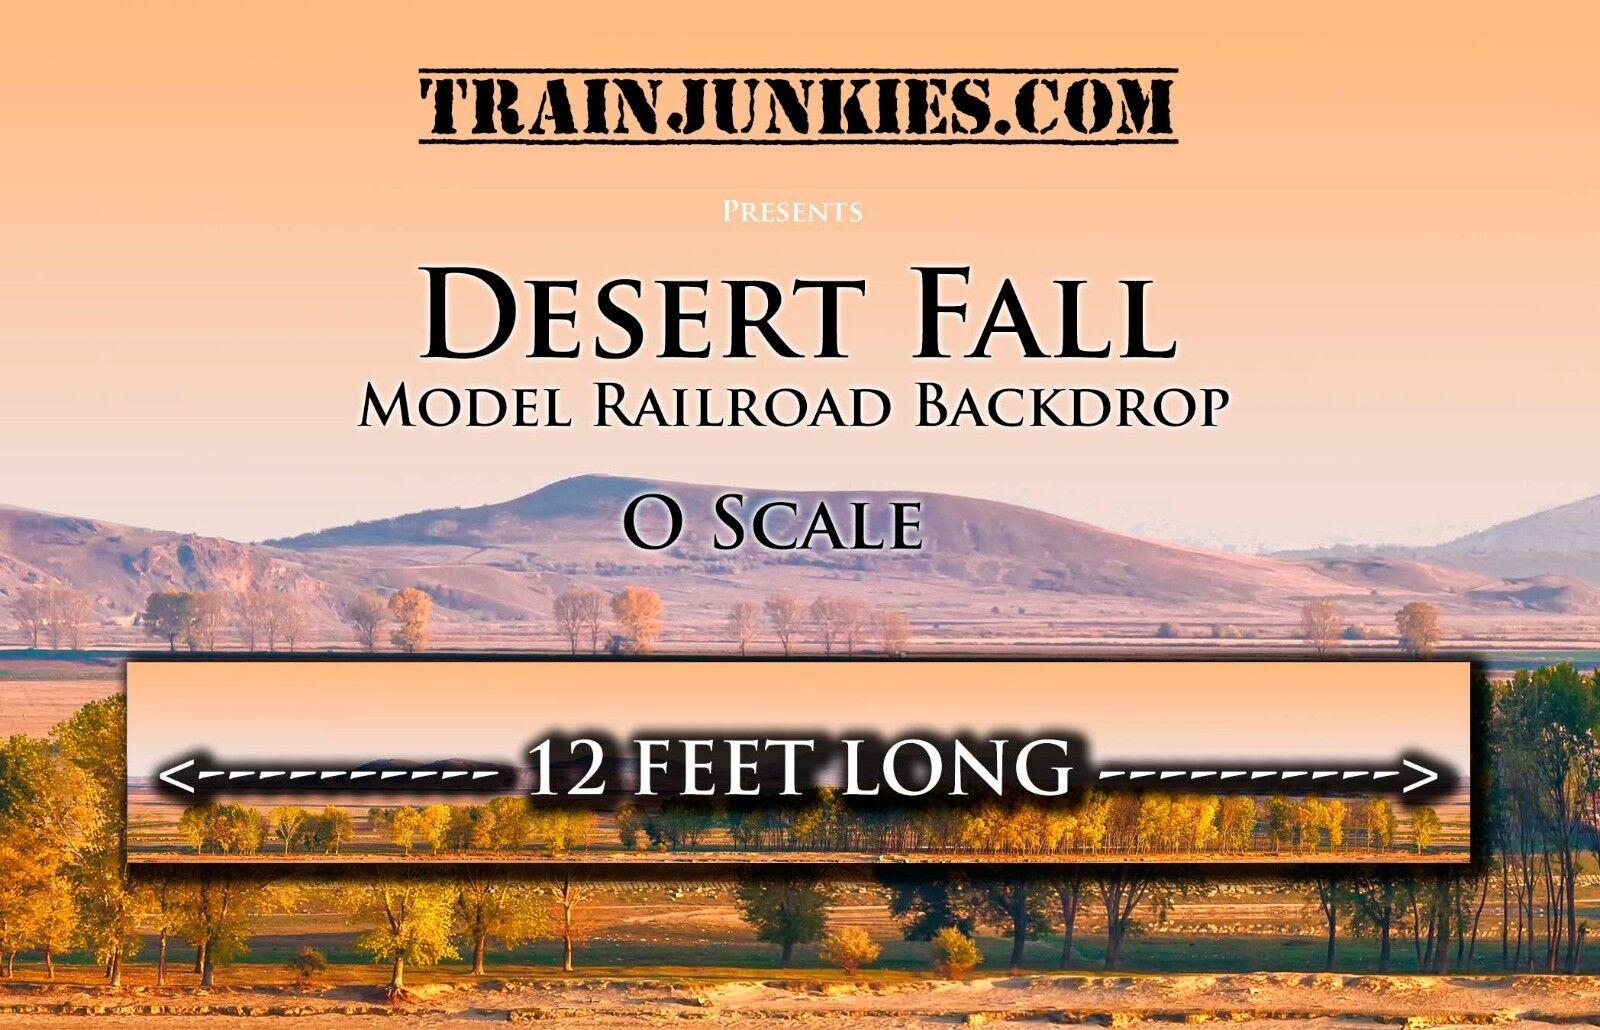 Tren Junkies o escala  caída del desierto  modelo del ferrocarril telón de fondo 24x144